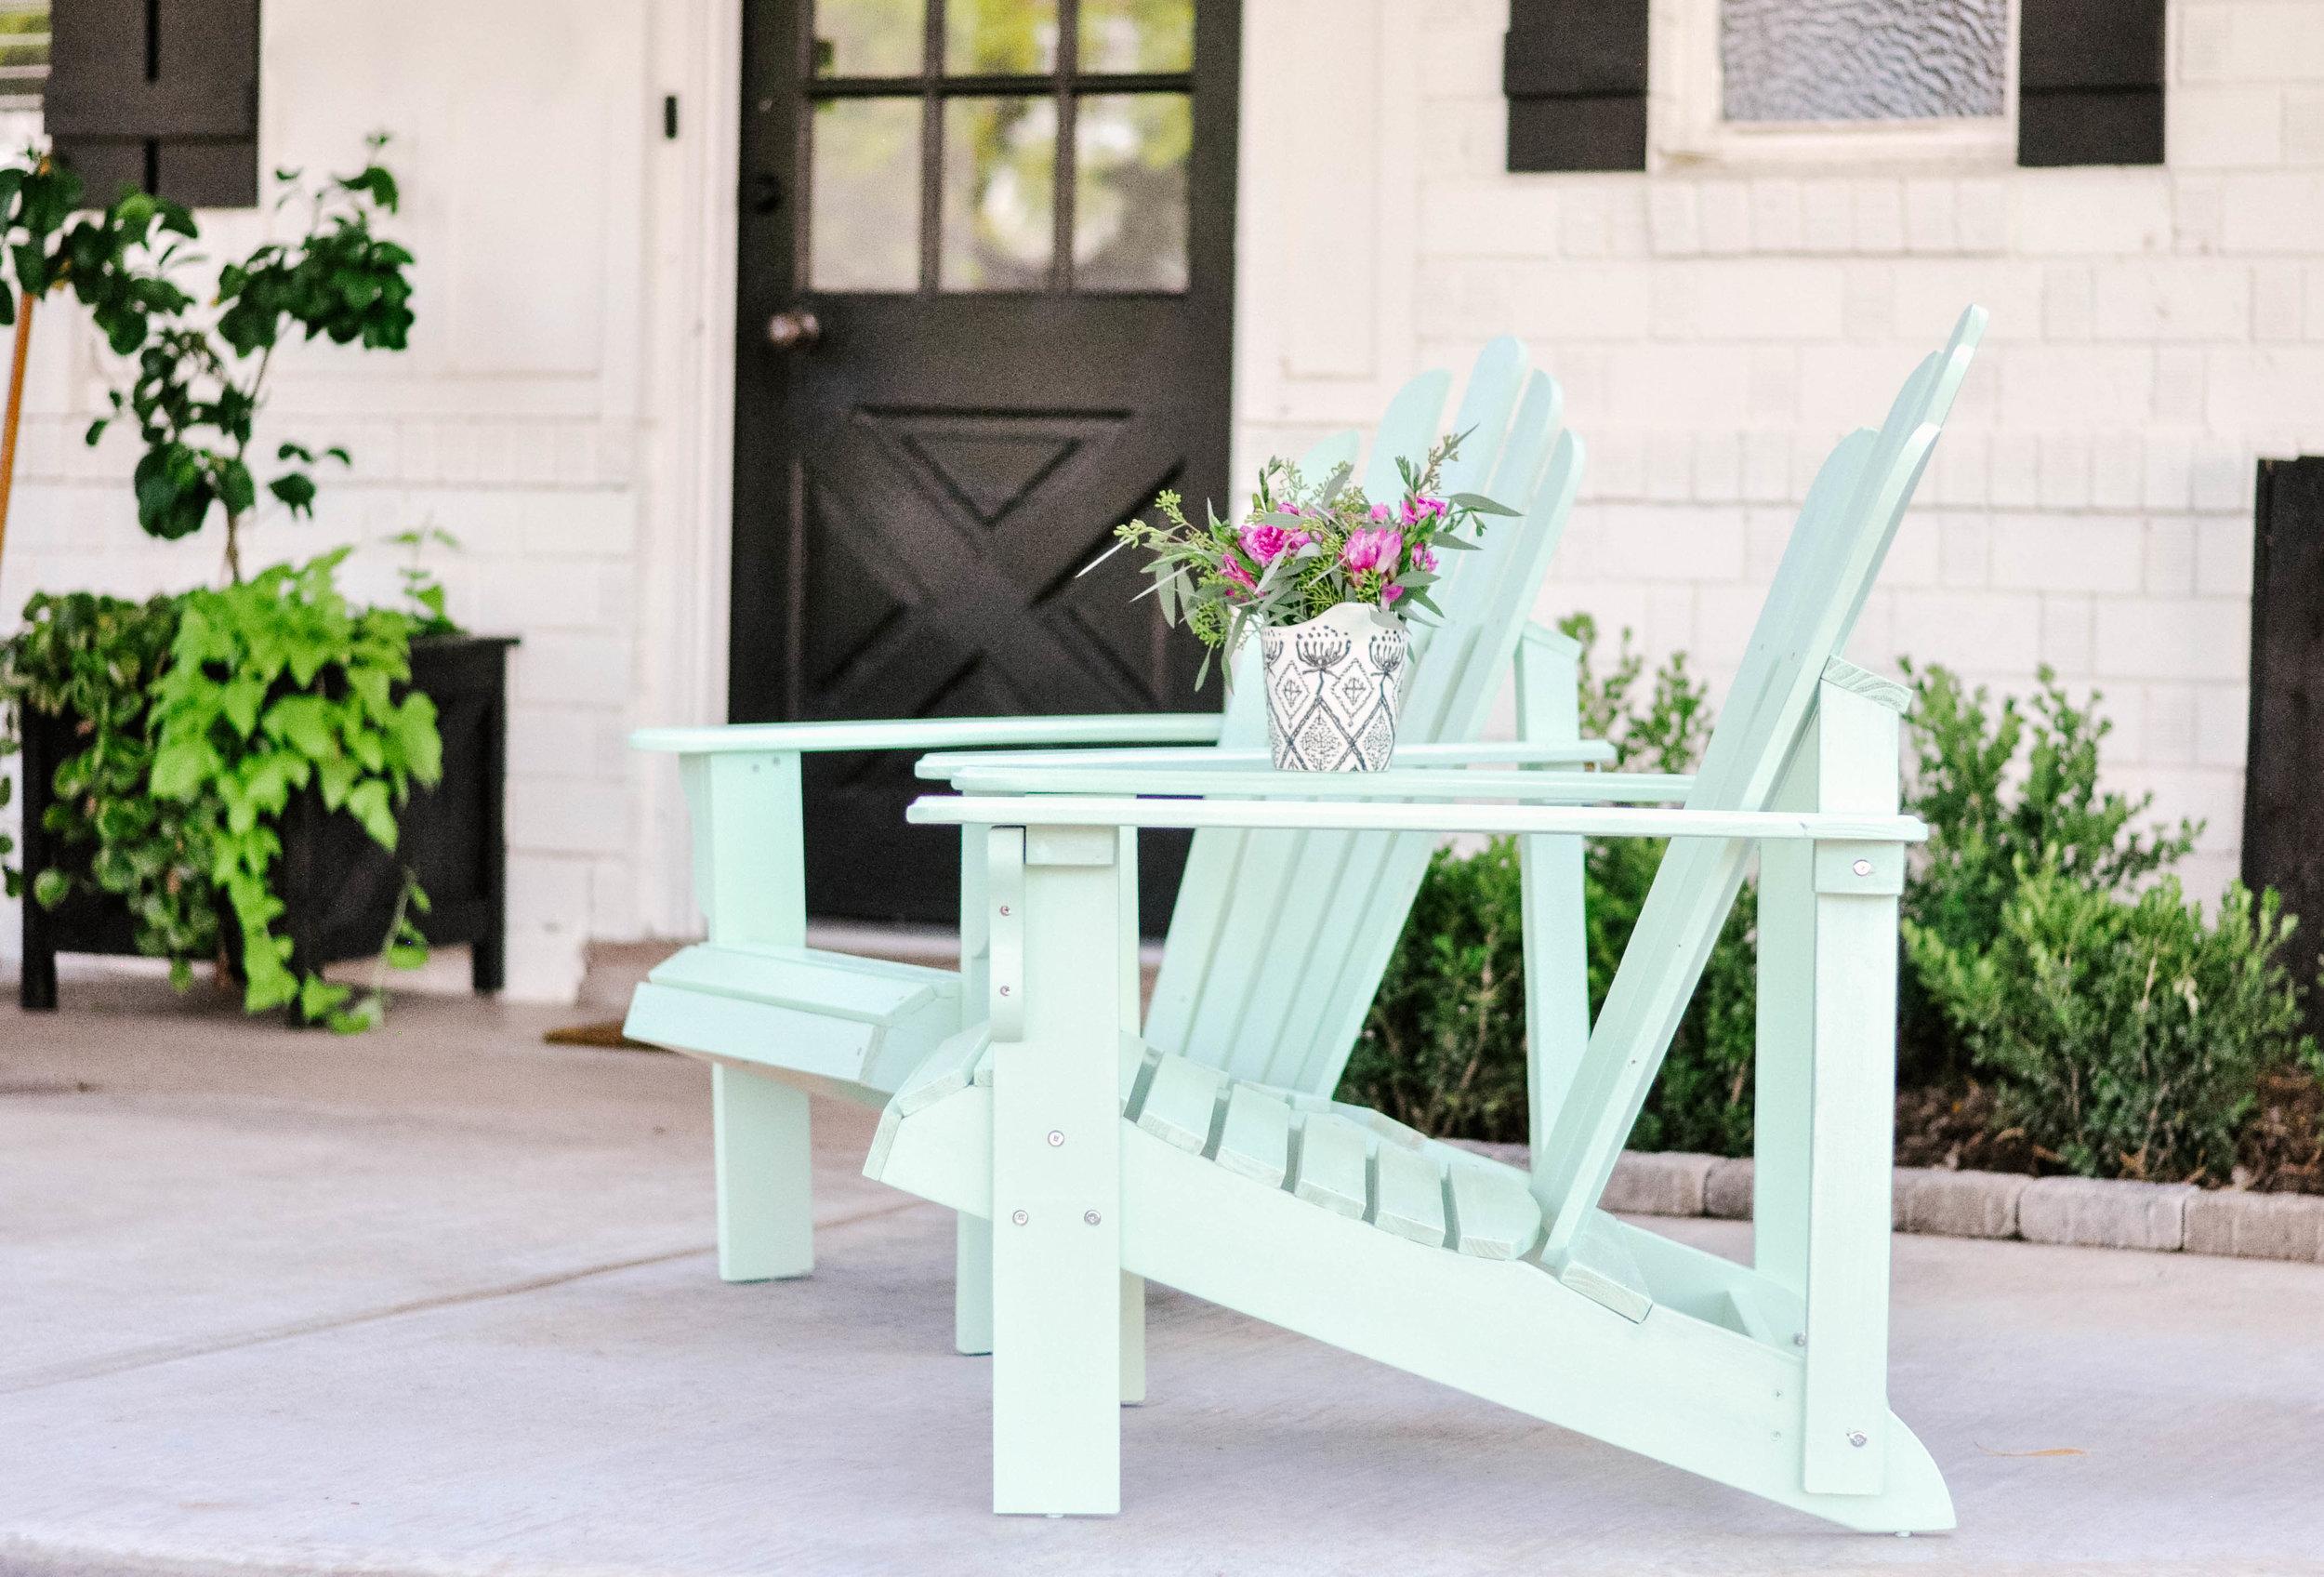 Affordable-Adirondack-Chairs.jpg